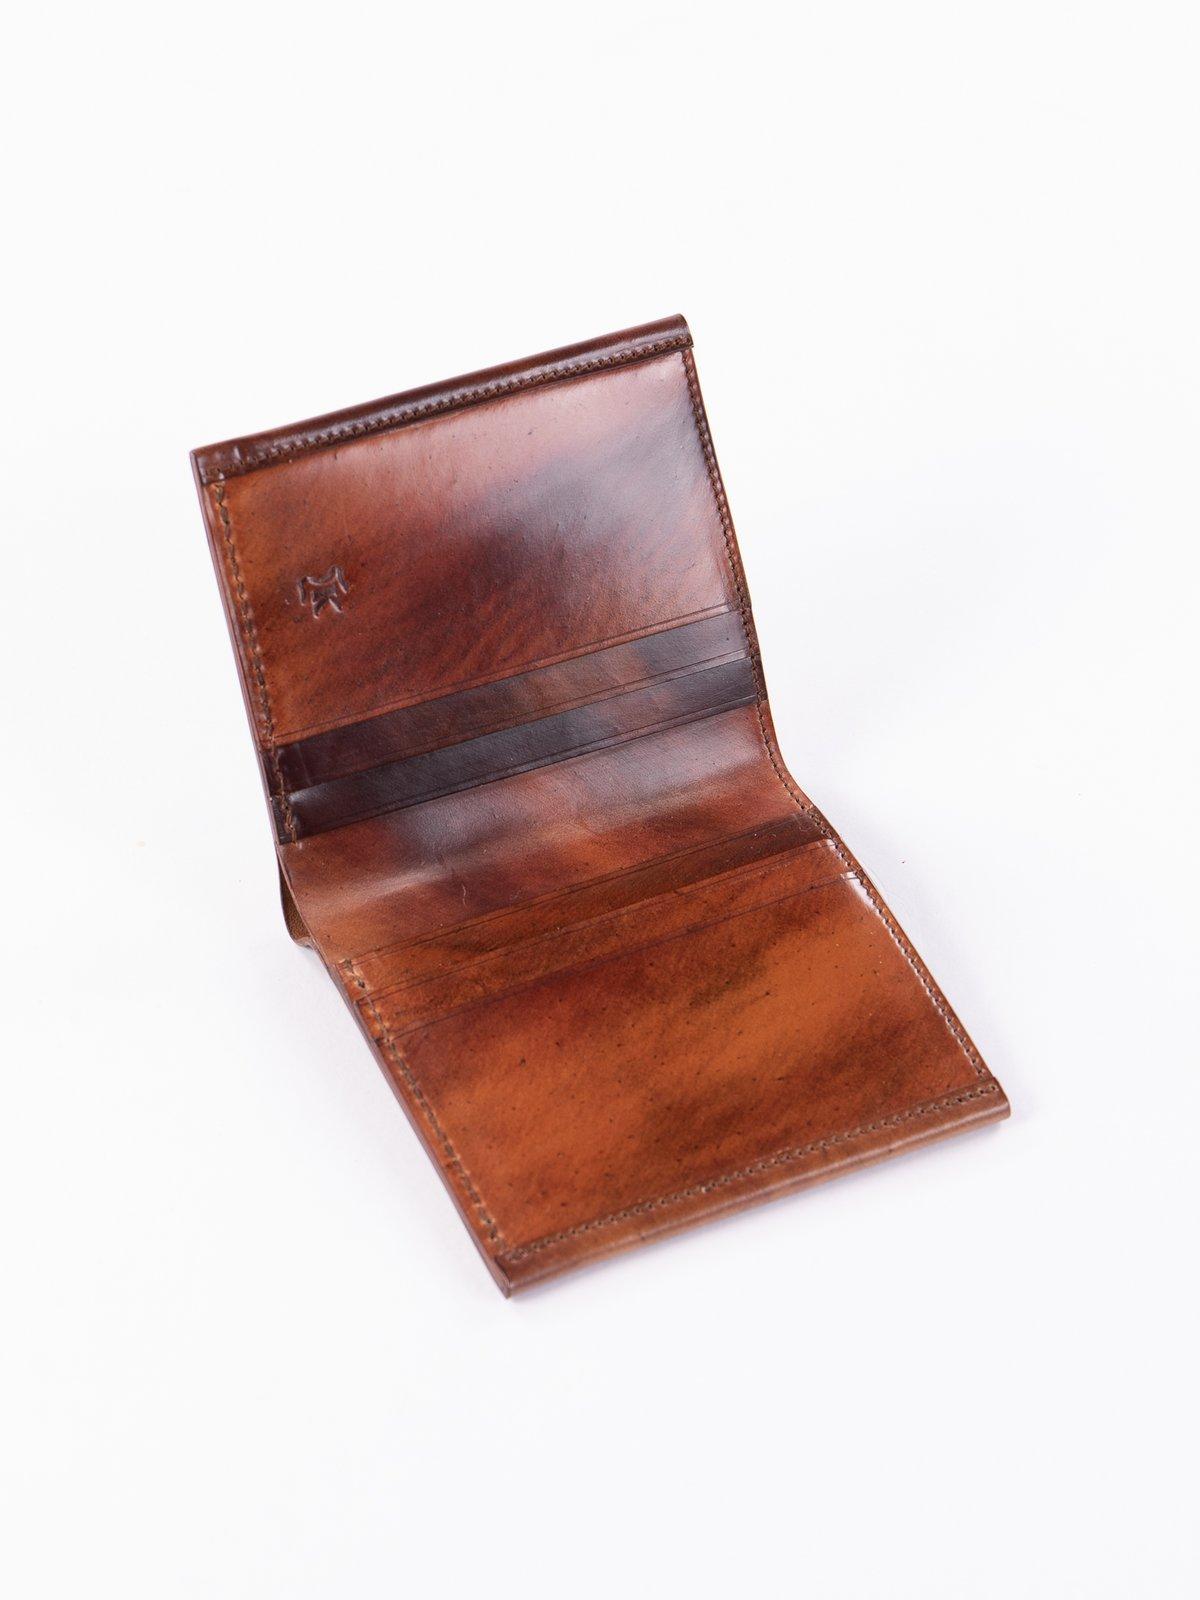 Washed Color 8 Horween Cordovan 3–3 Wallet - Image 2